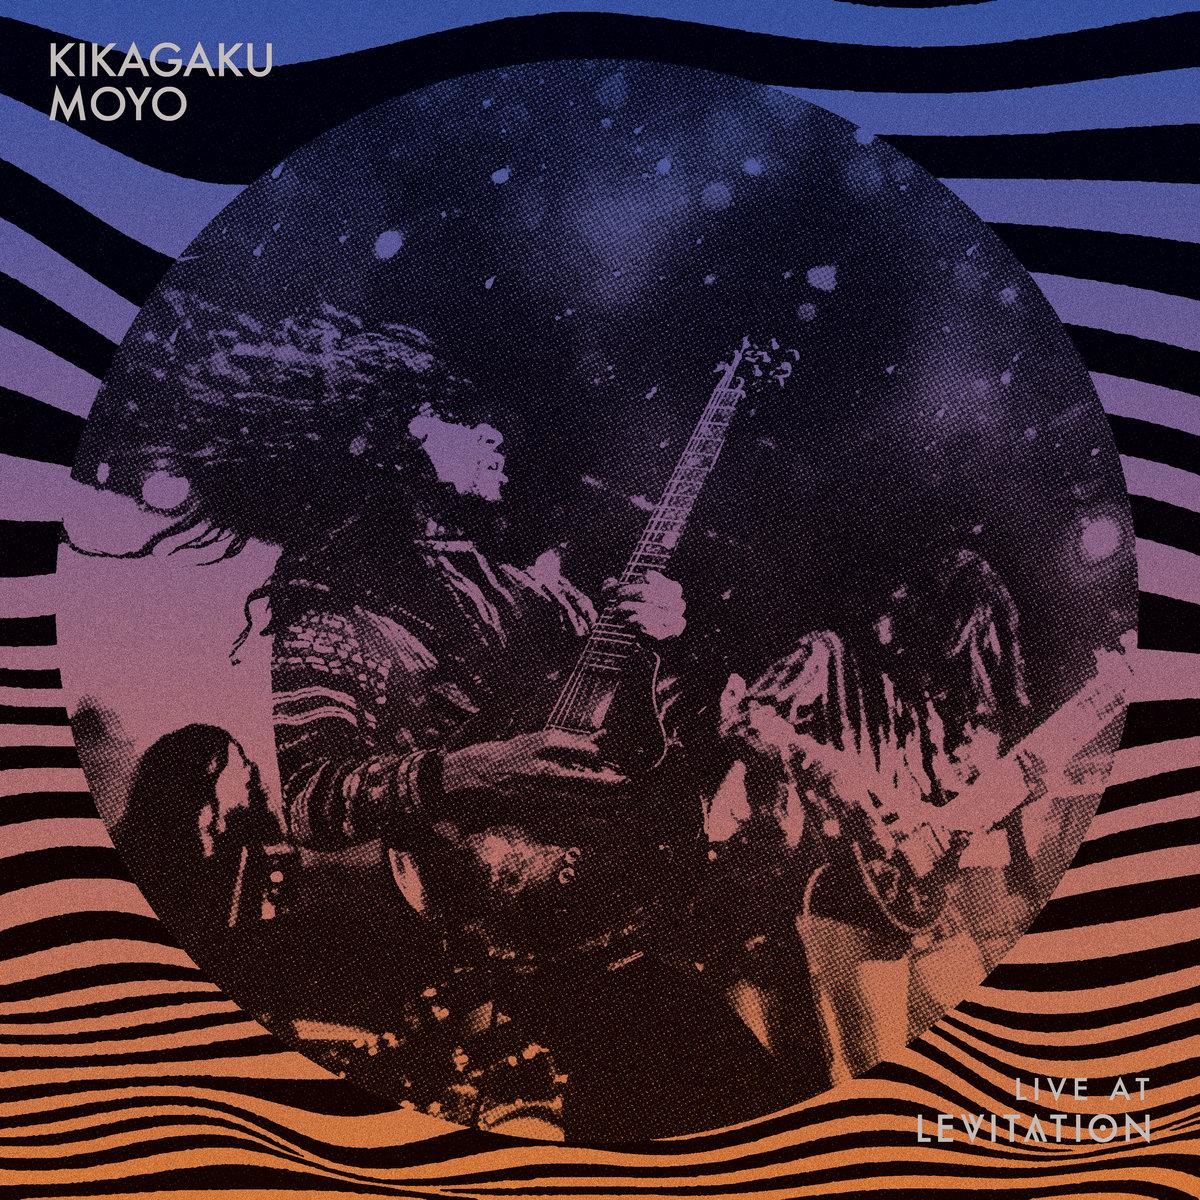 Kikagaku Moyo - Live at Levitation jpg